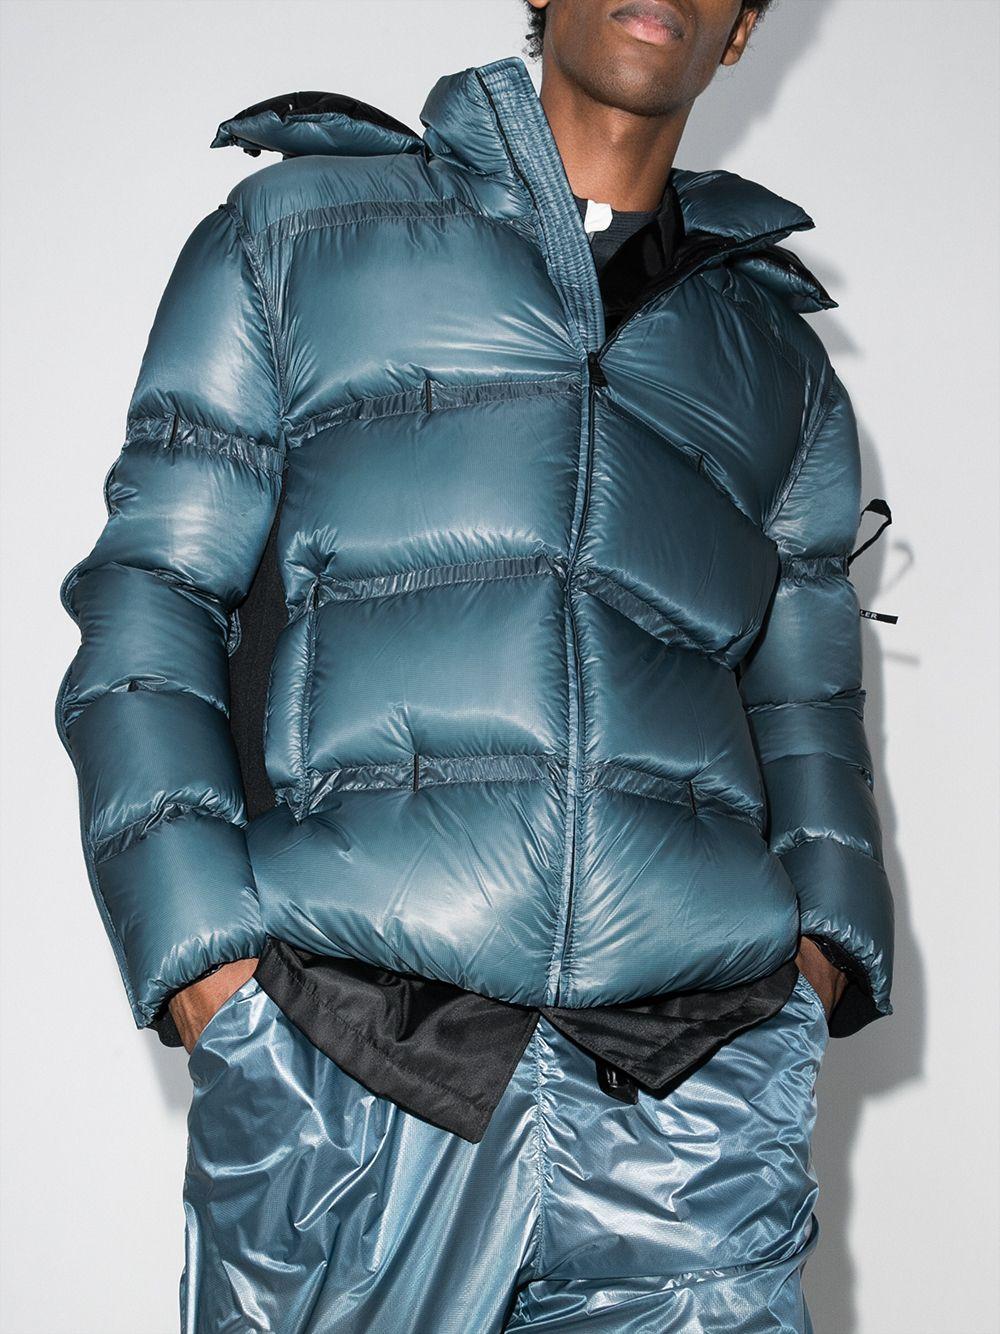 blue Ramis puffer jacket by 5 Moncler Genius x Craig Green MONCLER GENIUS |  | RAMIS 1A503-10-C0624720